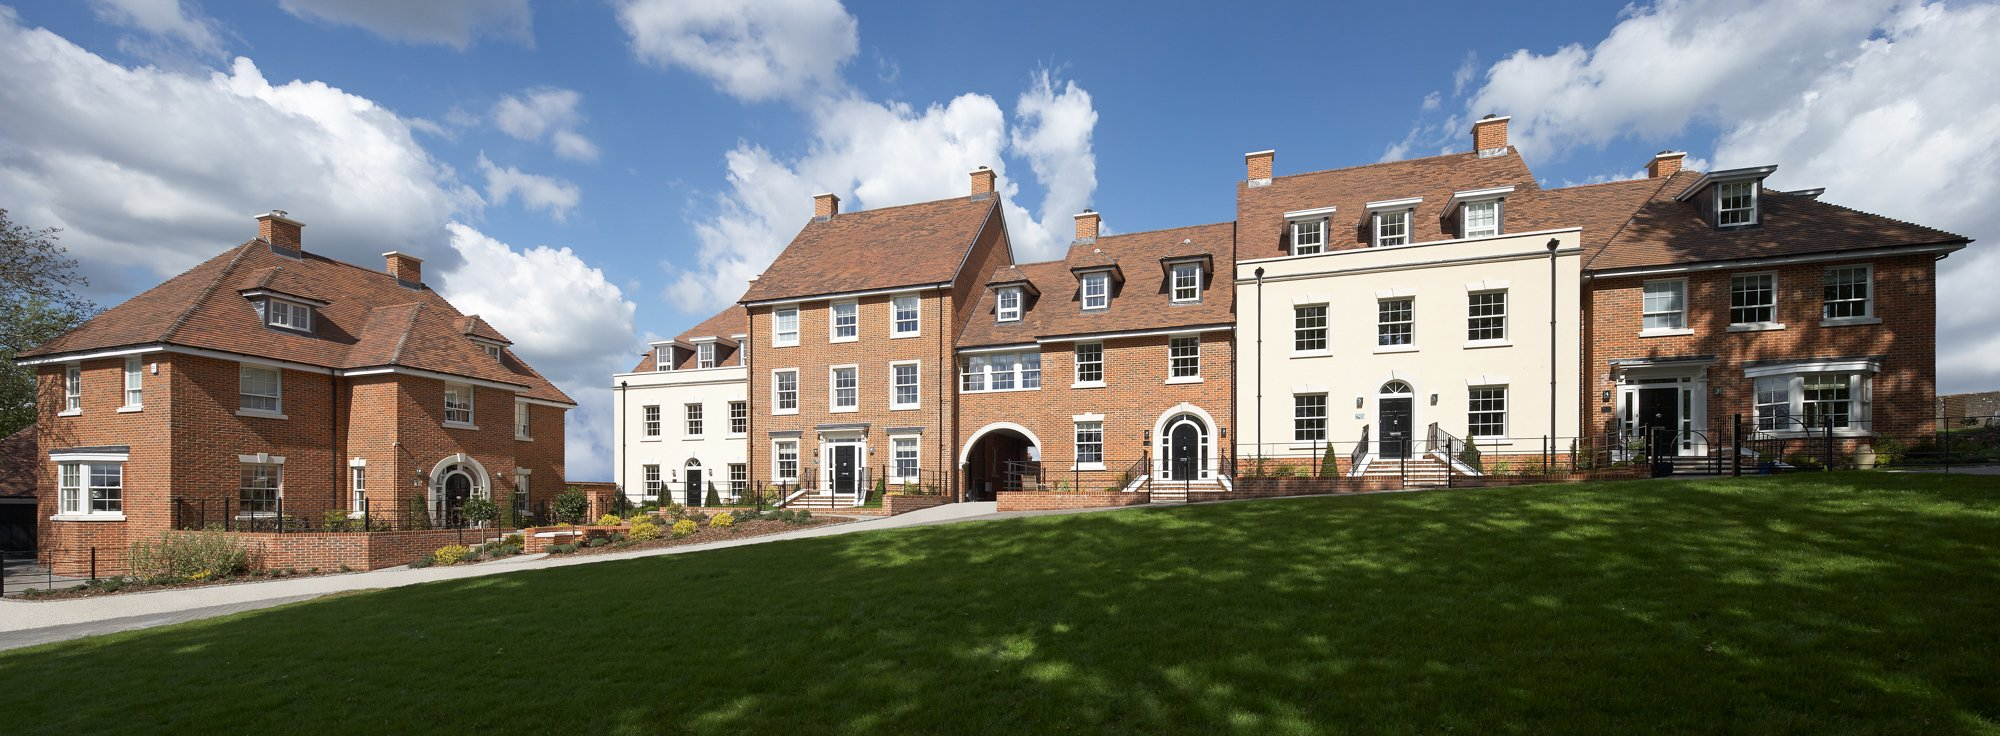 Alfred Homes Prestigious New Homes In Winchester